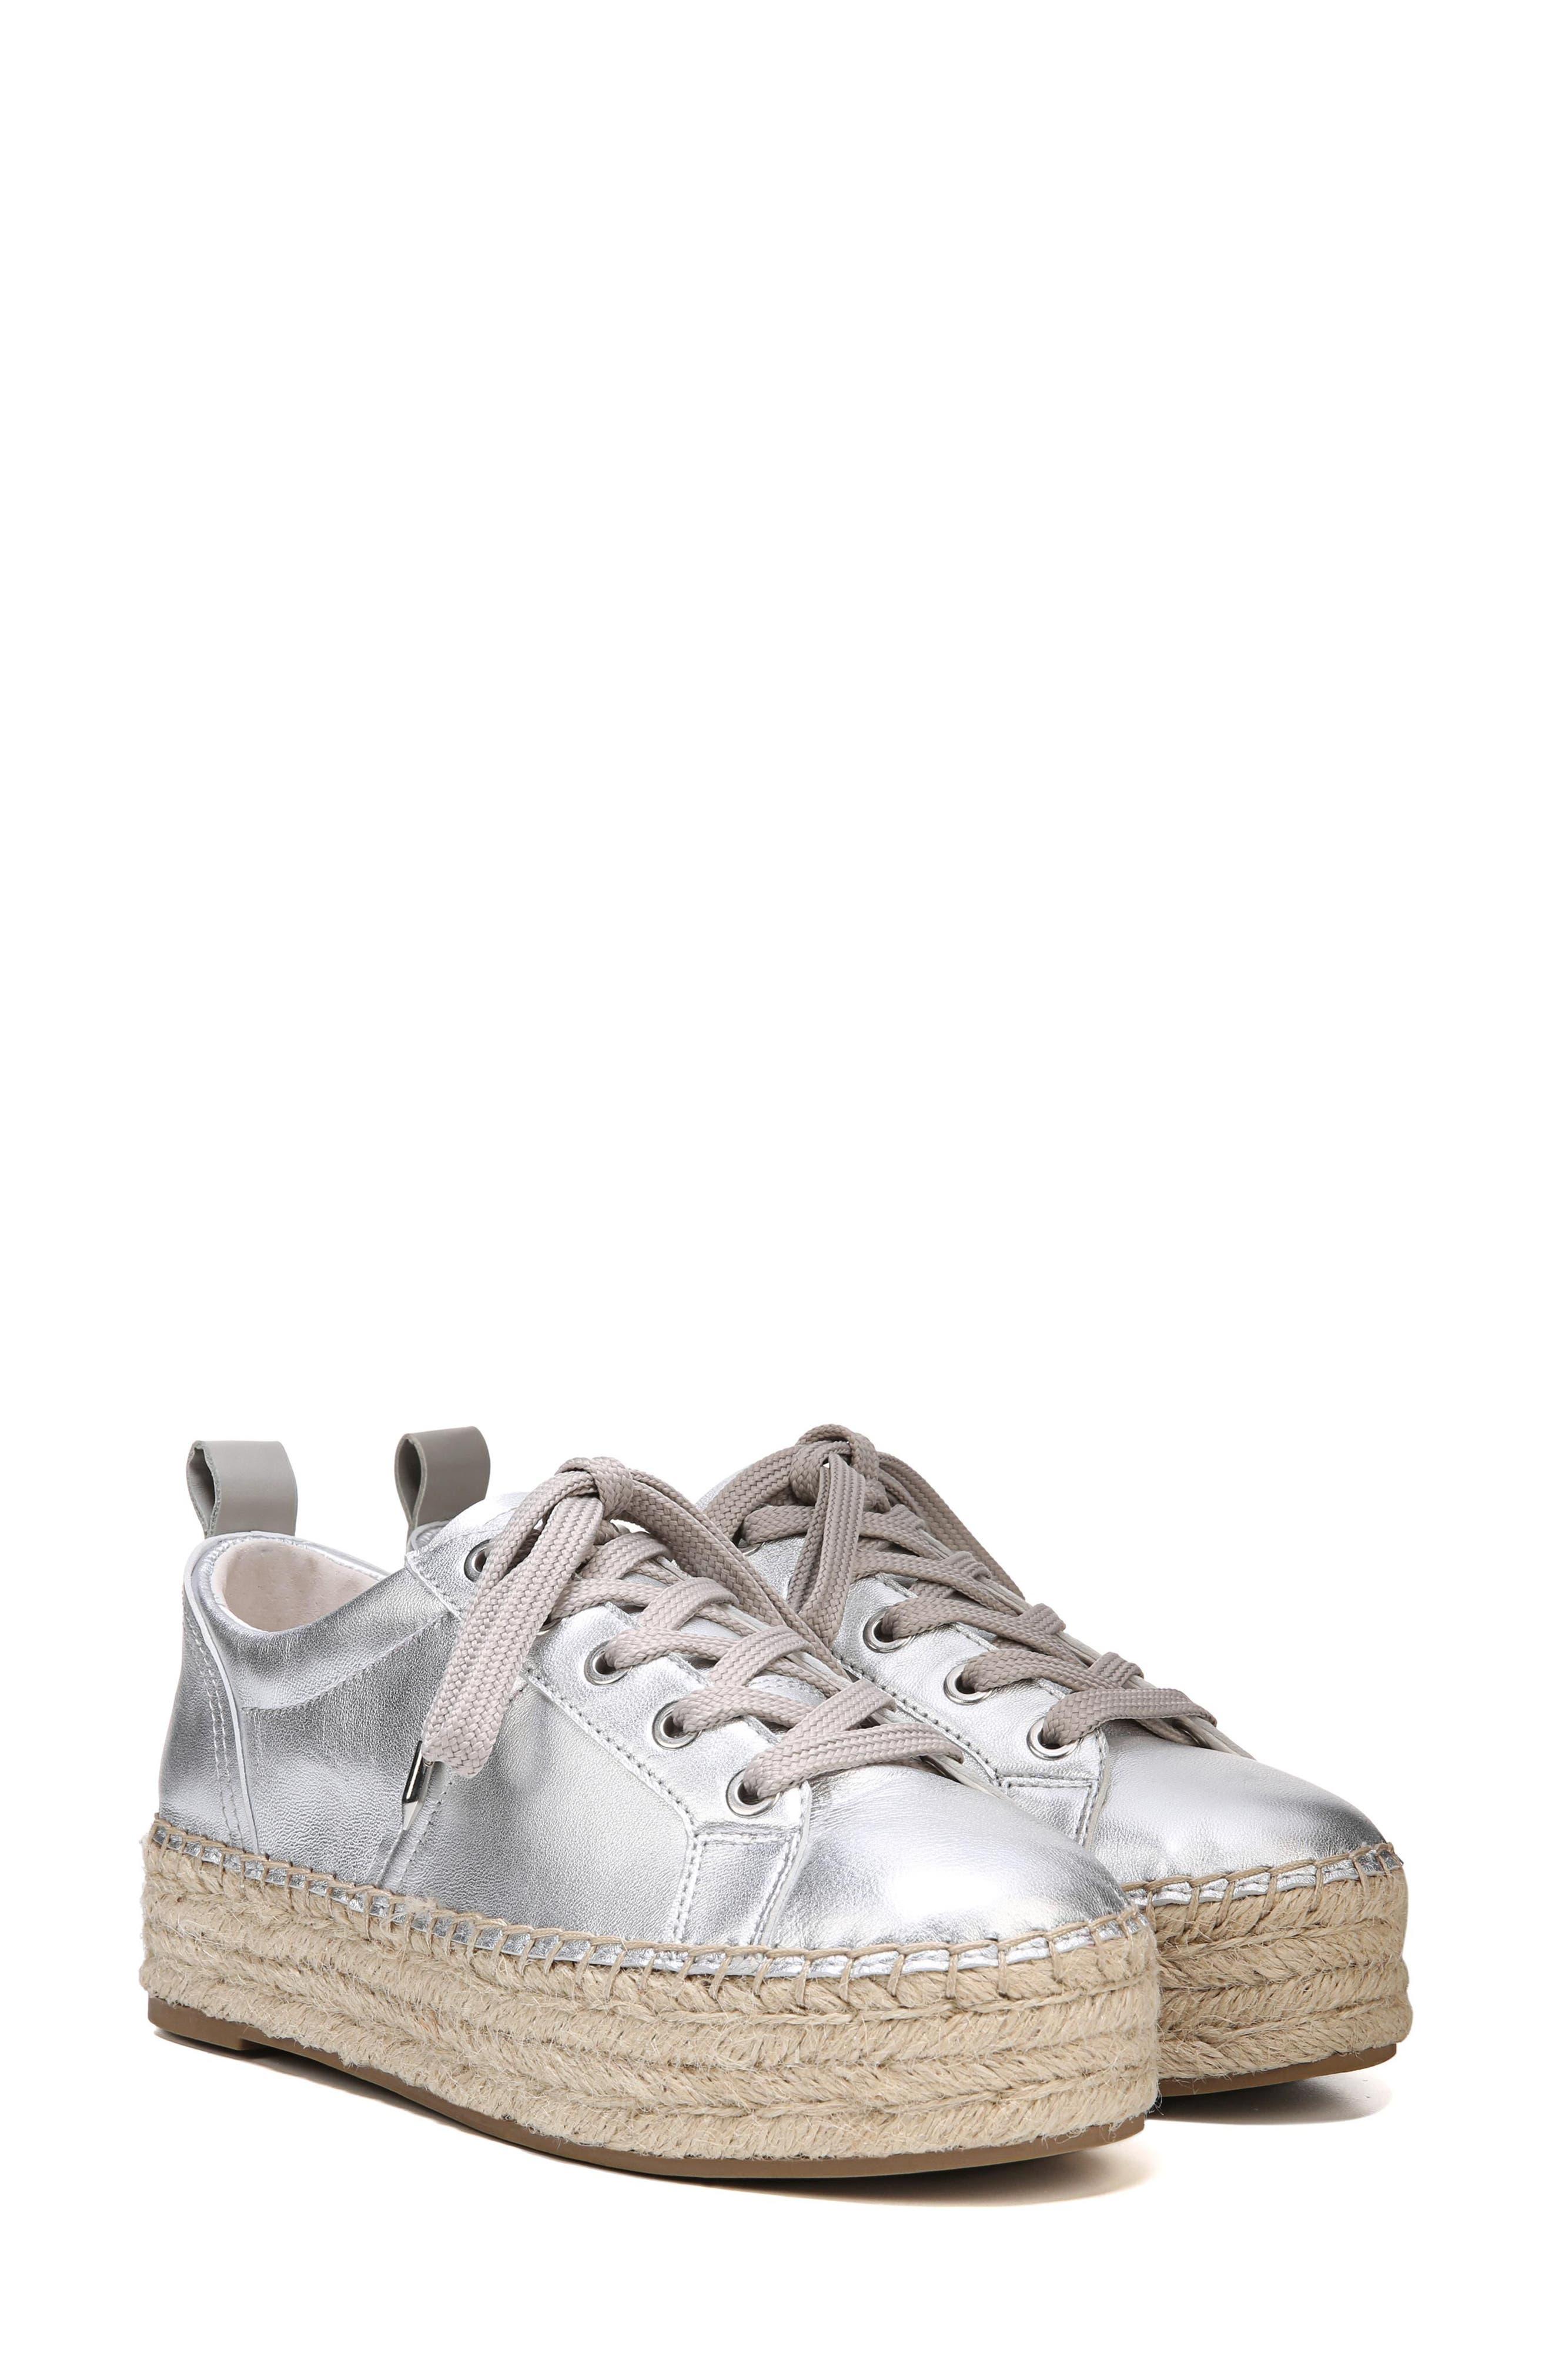 Carleigh Espadrille Sneaker,                             Alternate thumbnail 8, color,                             040